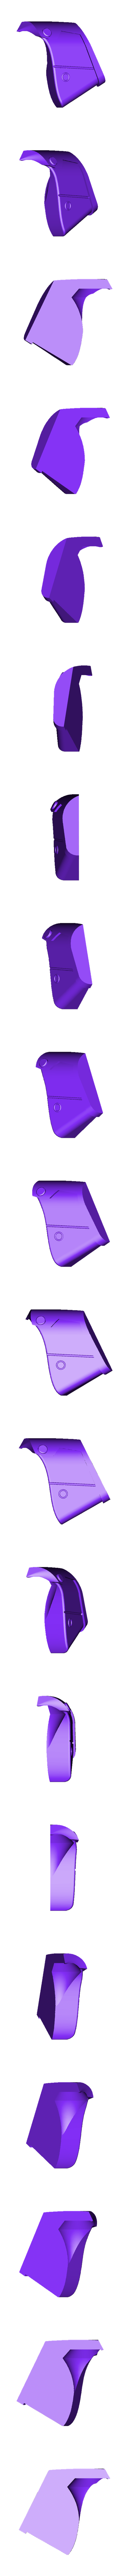 Shoulder_Rest_R.stl Télécharger fichier STL gratuit Borderlands Bandit Room Clener Shotgun • Modèle pour impression 3D, Dsk